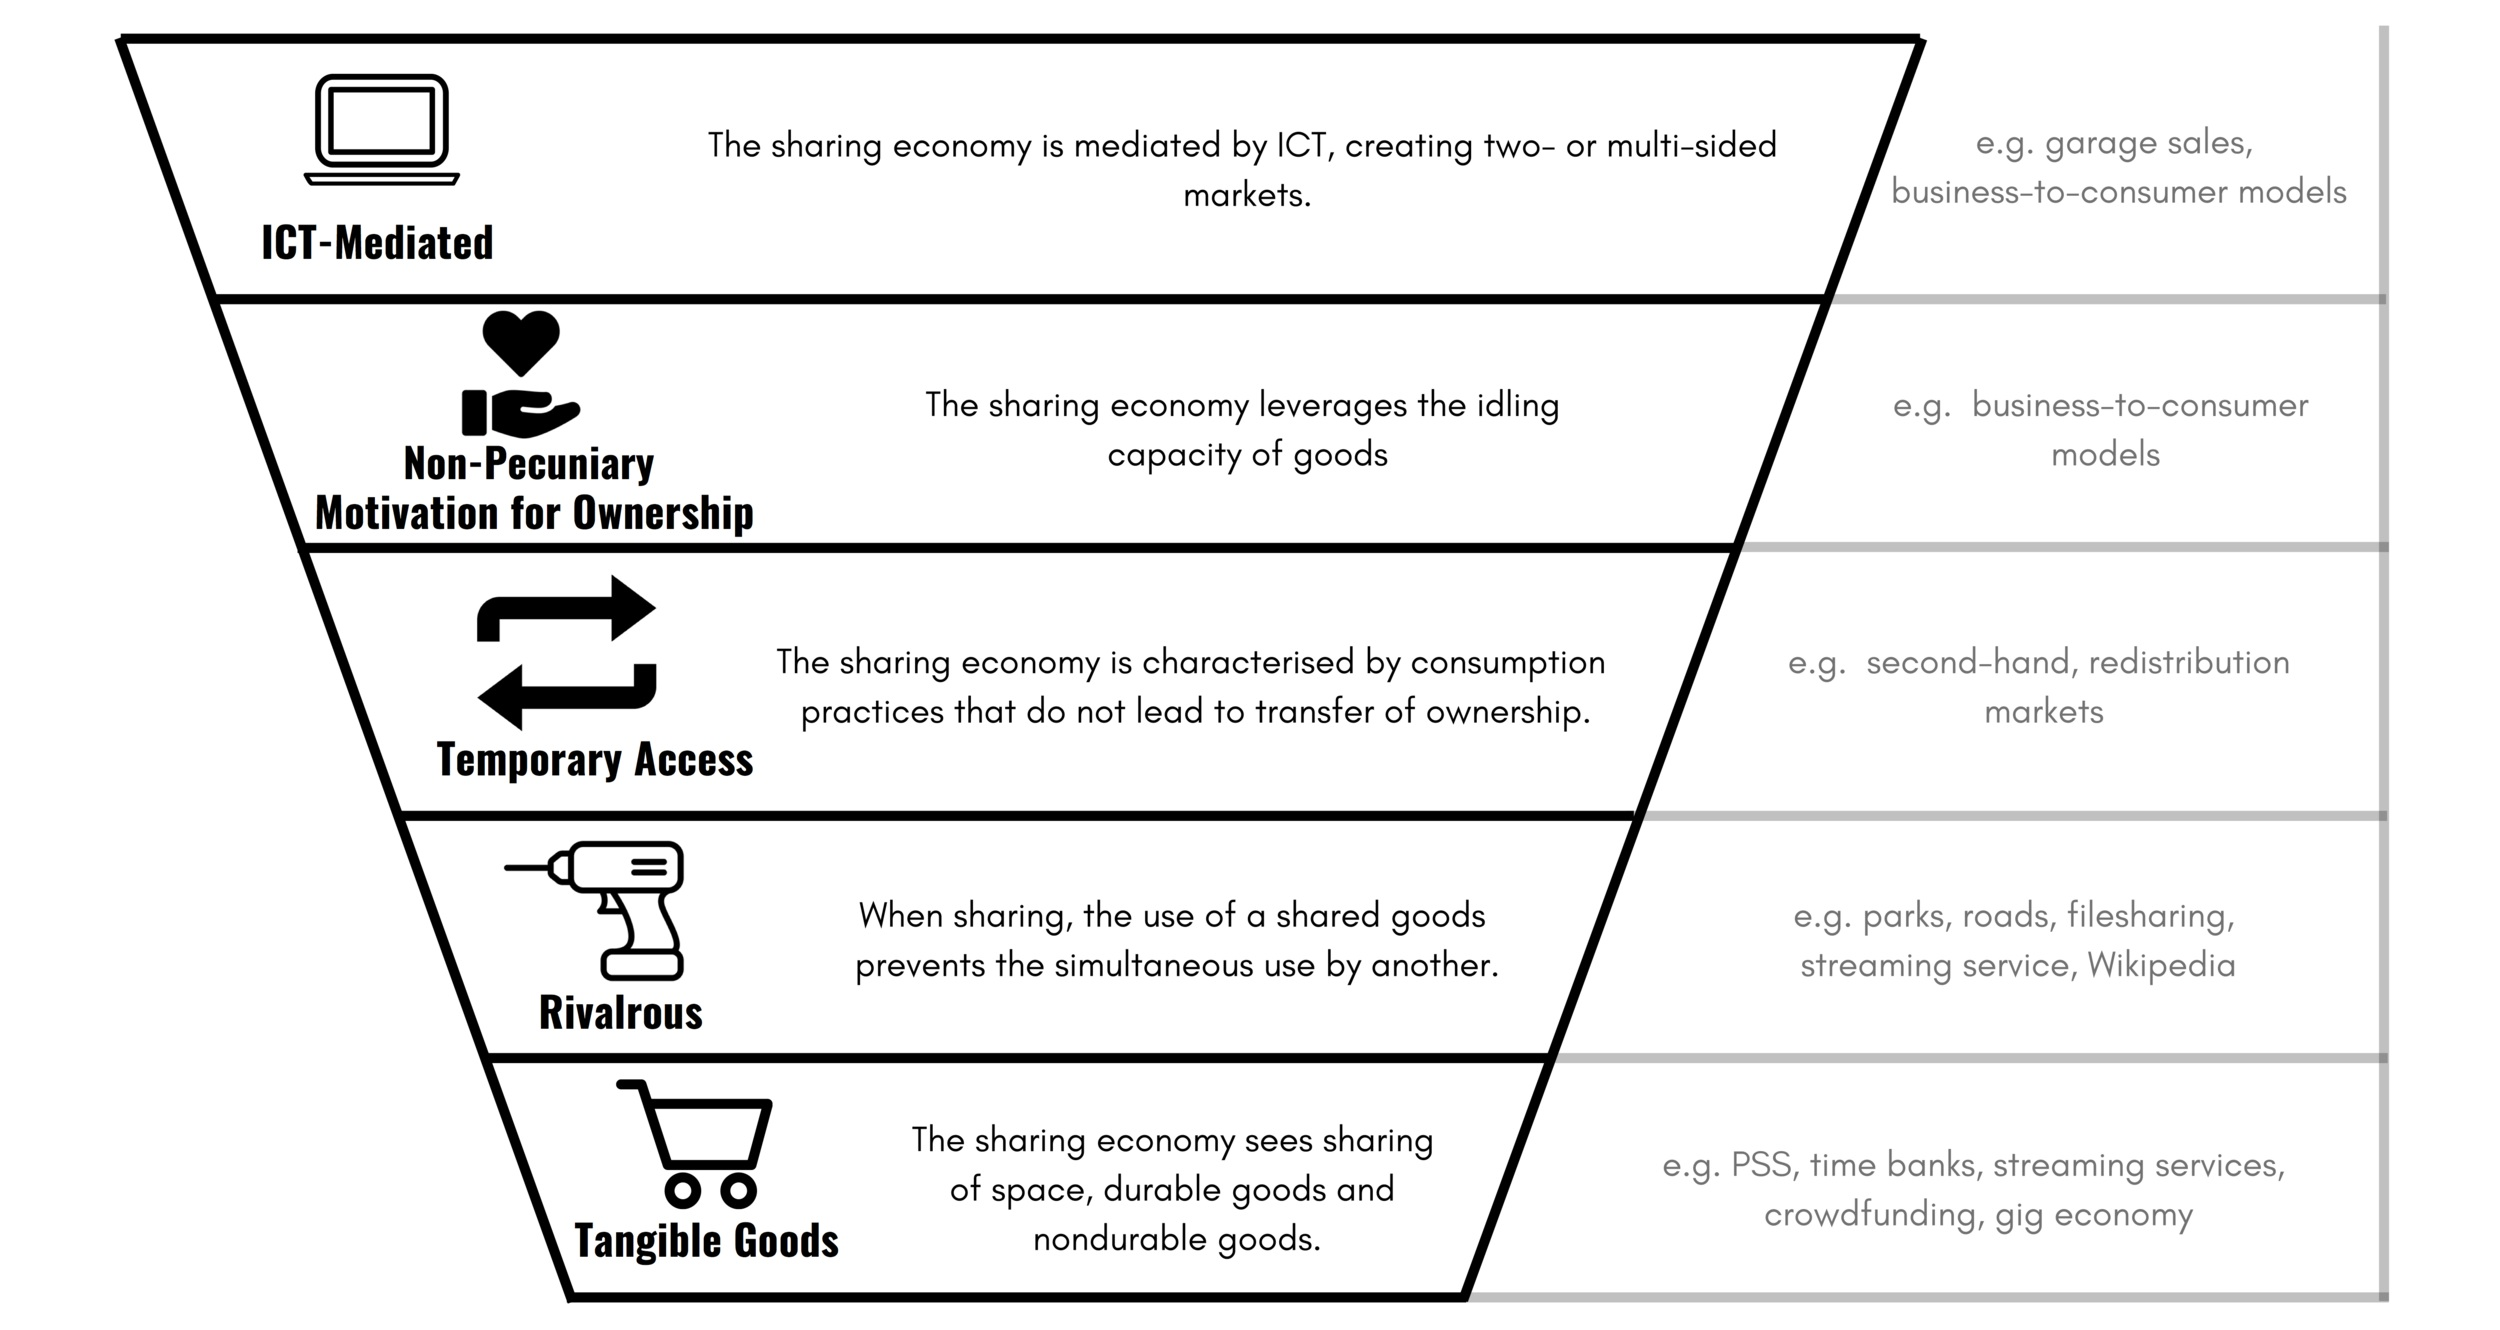 Semantic+Properties+of+the+Sharing+Economy+%28Final%29.jpg